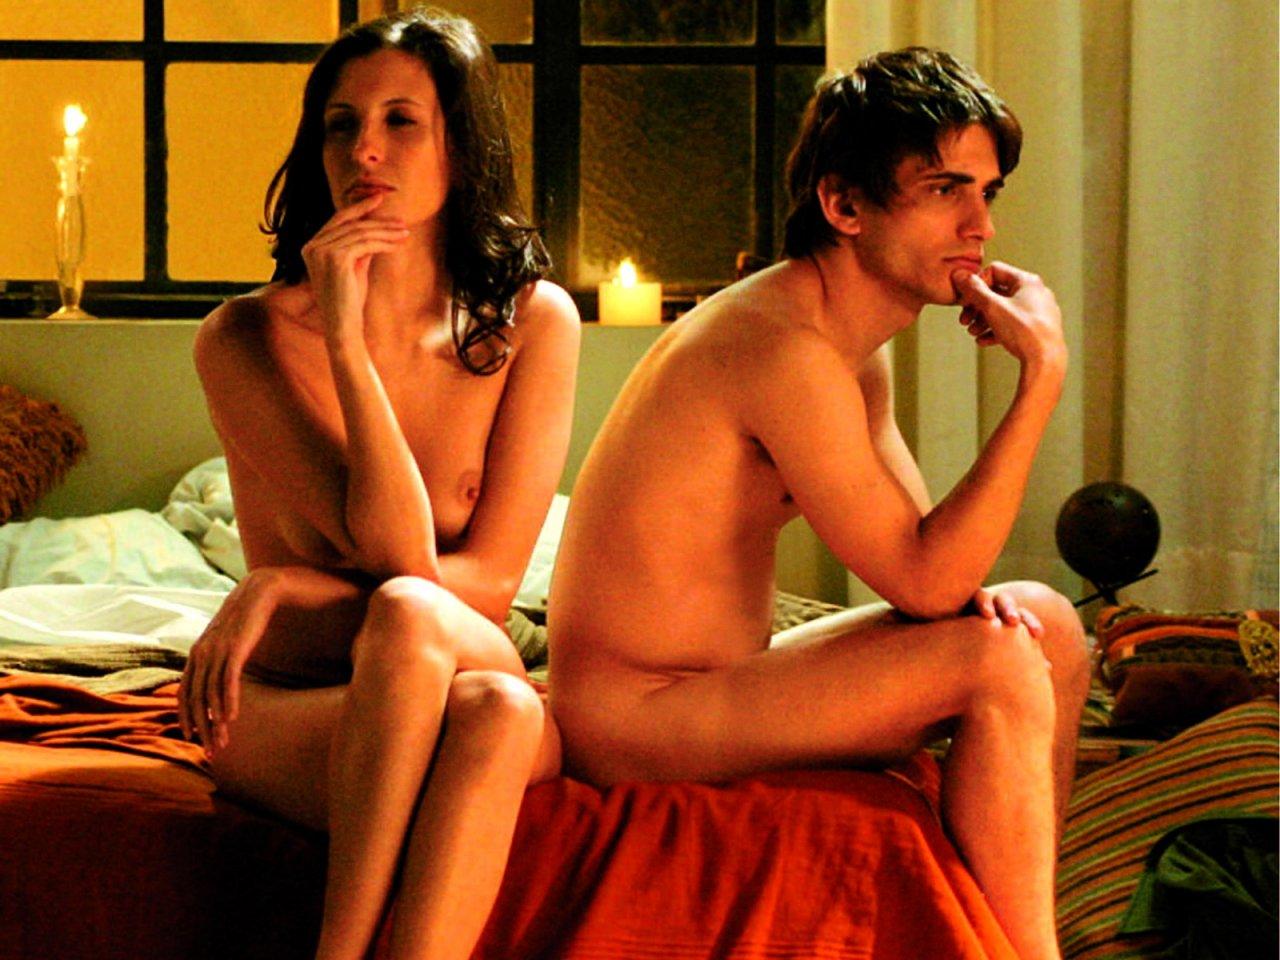 Афиша фильма Не смотри вниз (No mires para abajo)-драма, эротика 2009.